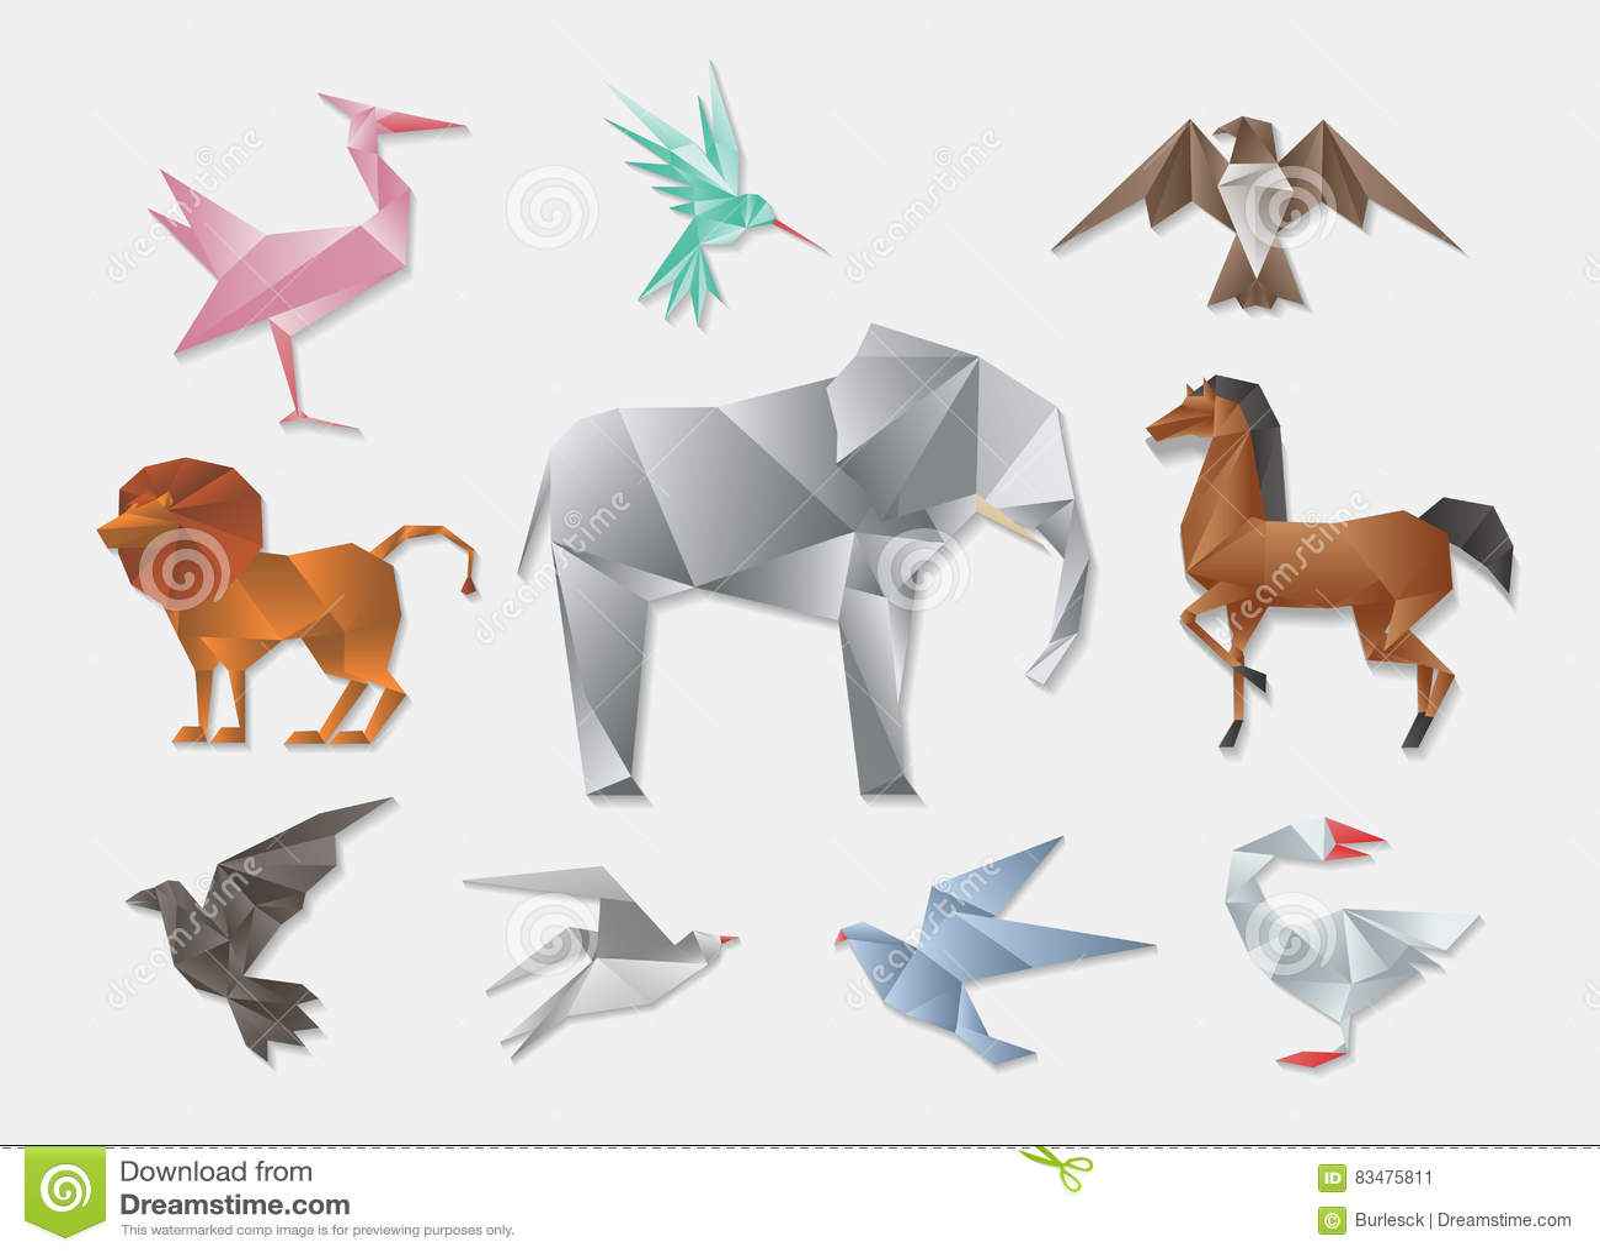 3d origami diagram animals chevy steering column wiring horse design royalty free stock photo cartoondealer